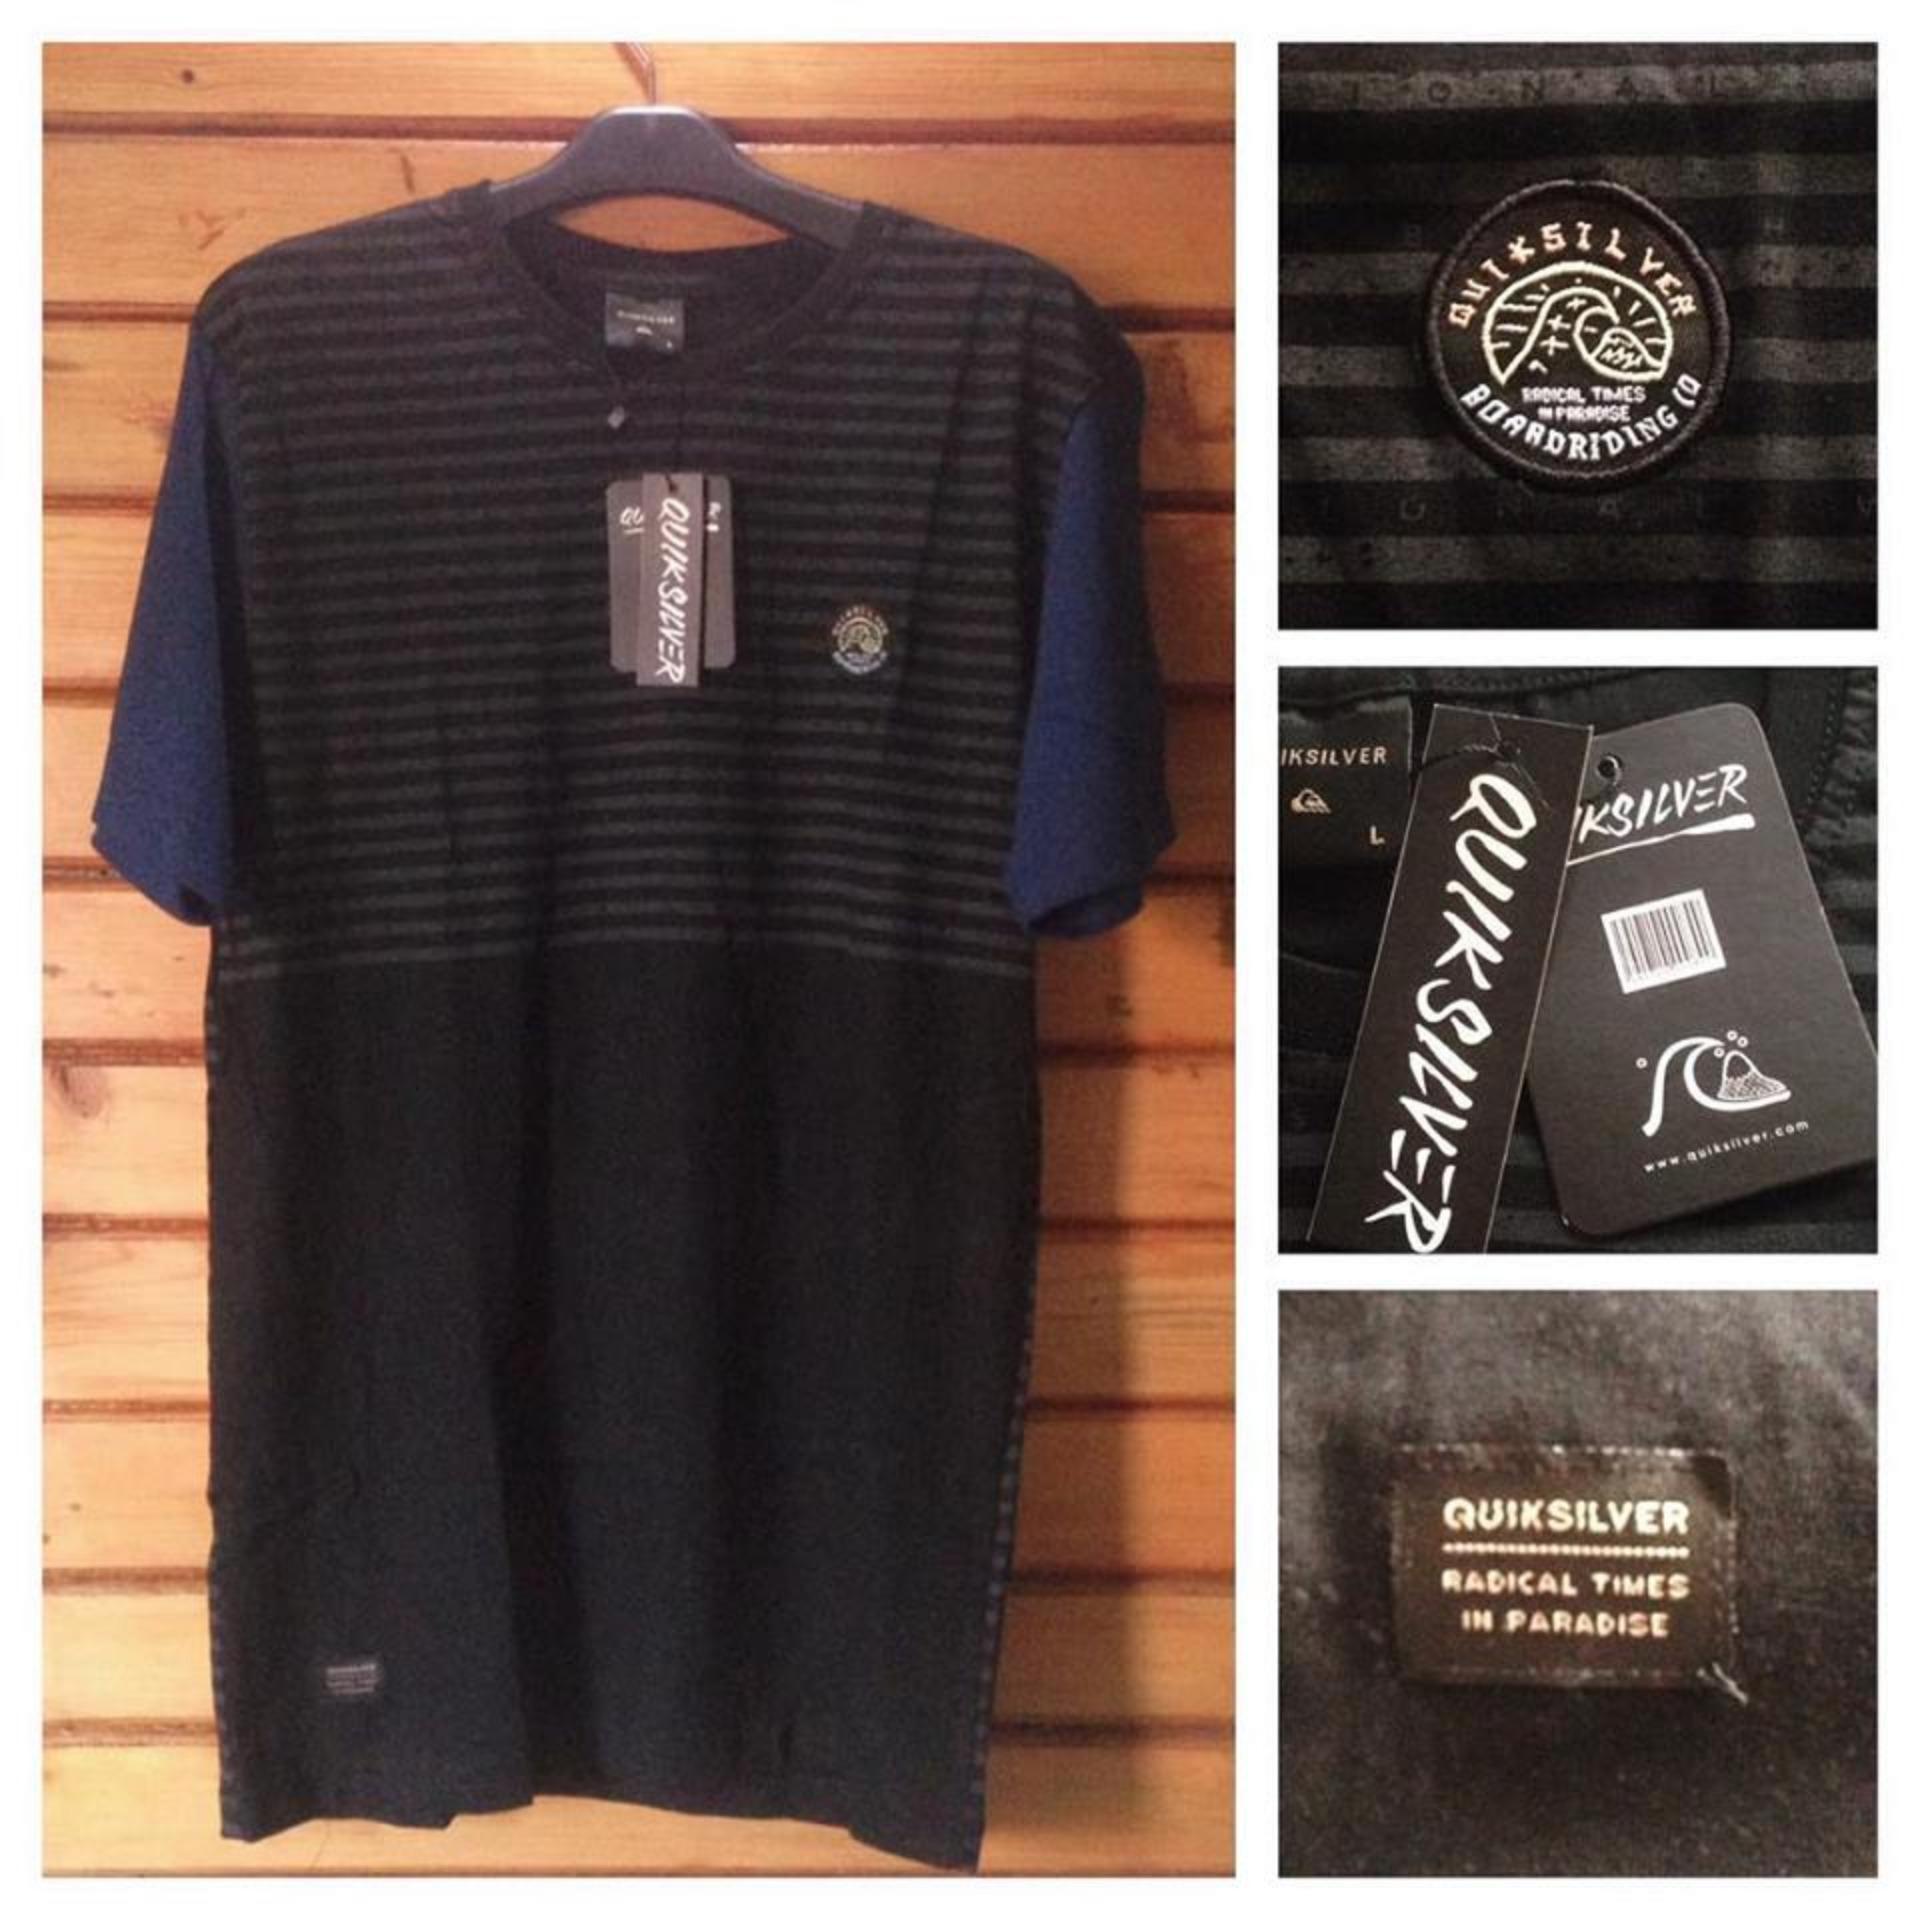 Cek Harga Baru Baju Kaos Distro Tshirt Surfing Premium Original ... 78aded1a20